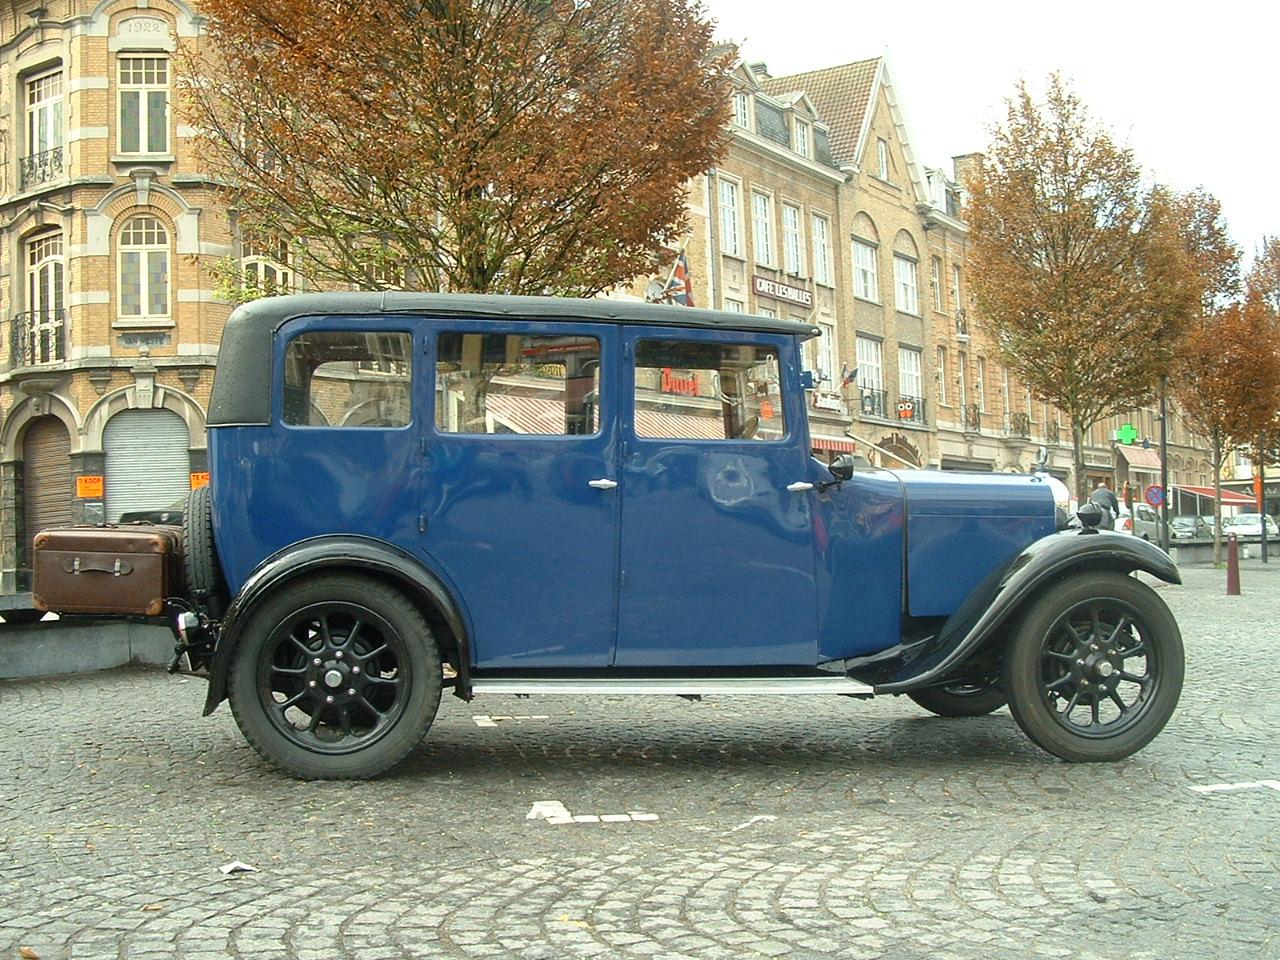 Vintage Ϲar in Ypres Square 1